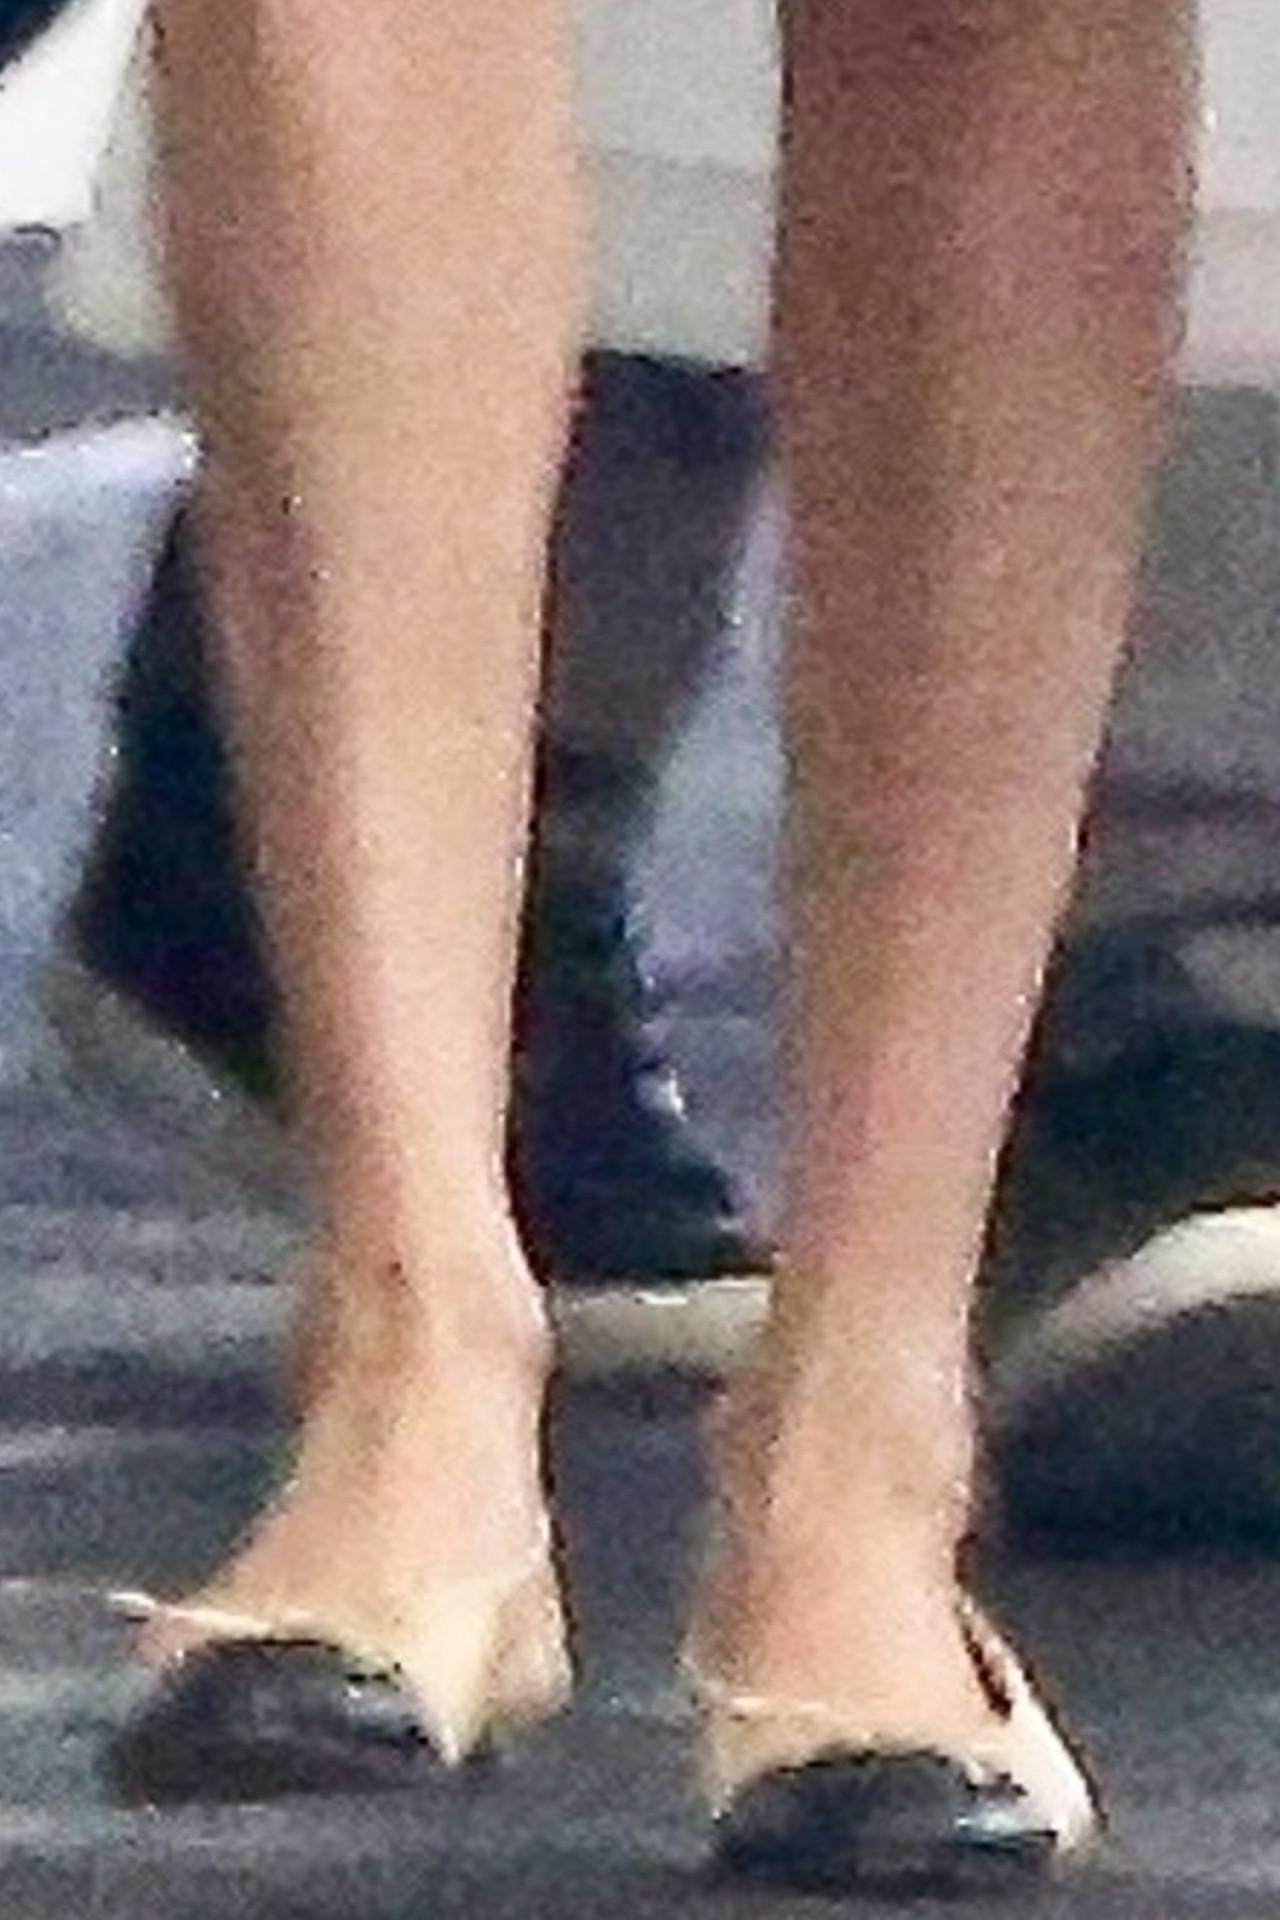 Meghan Markle pokazała zgrabne nogi.